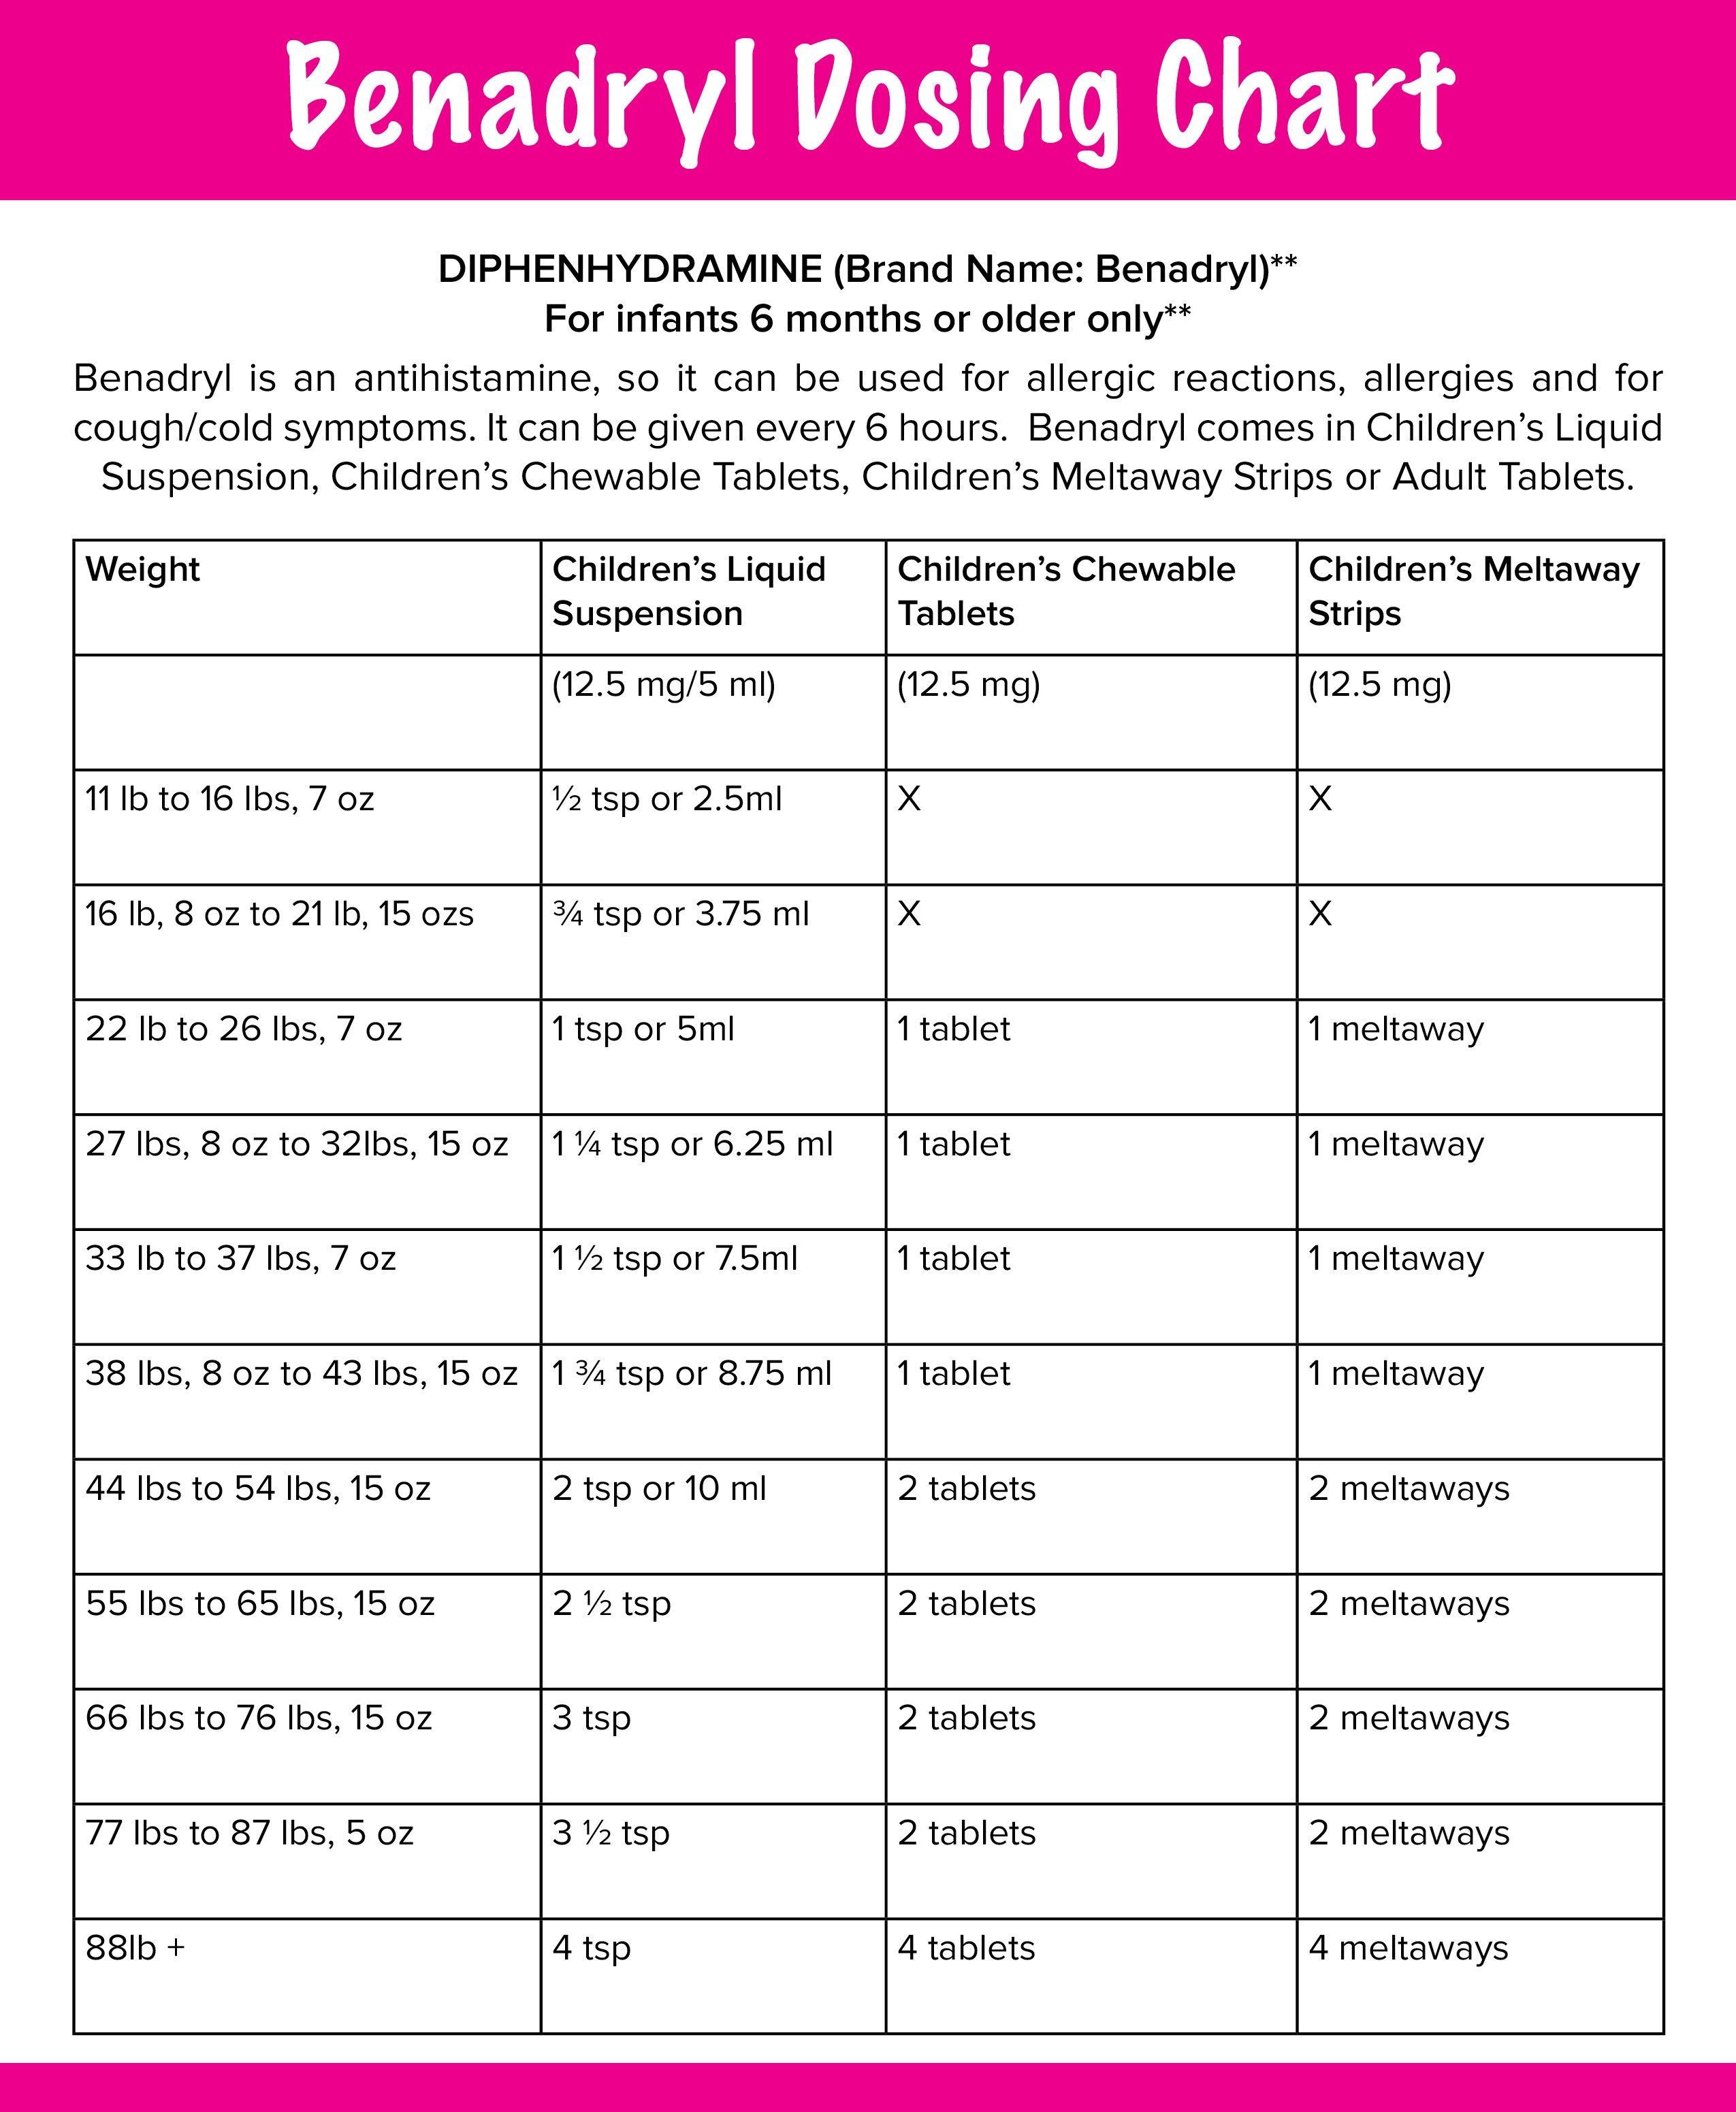 Dimetapp Dosage Chart : dimetapp, dosage, chart, Found, Phcpediatrics.com, Benadryl, Dosage,, Childrens, Medication